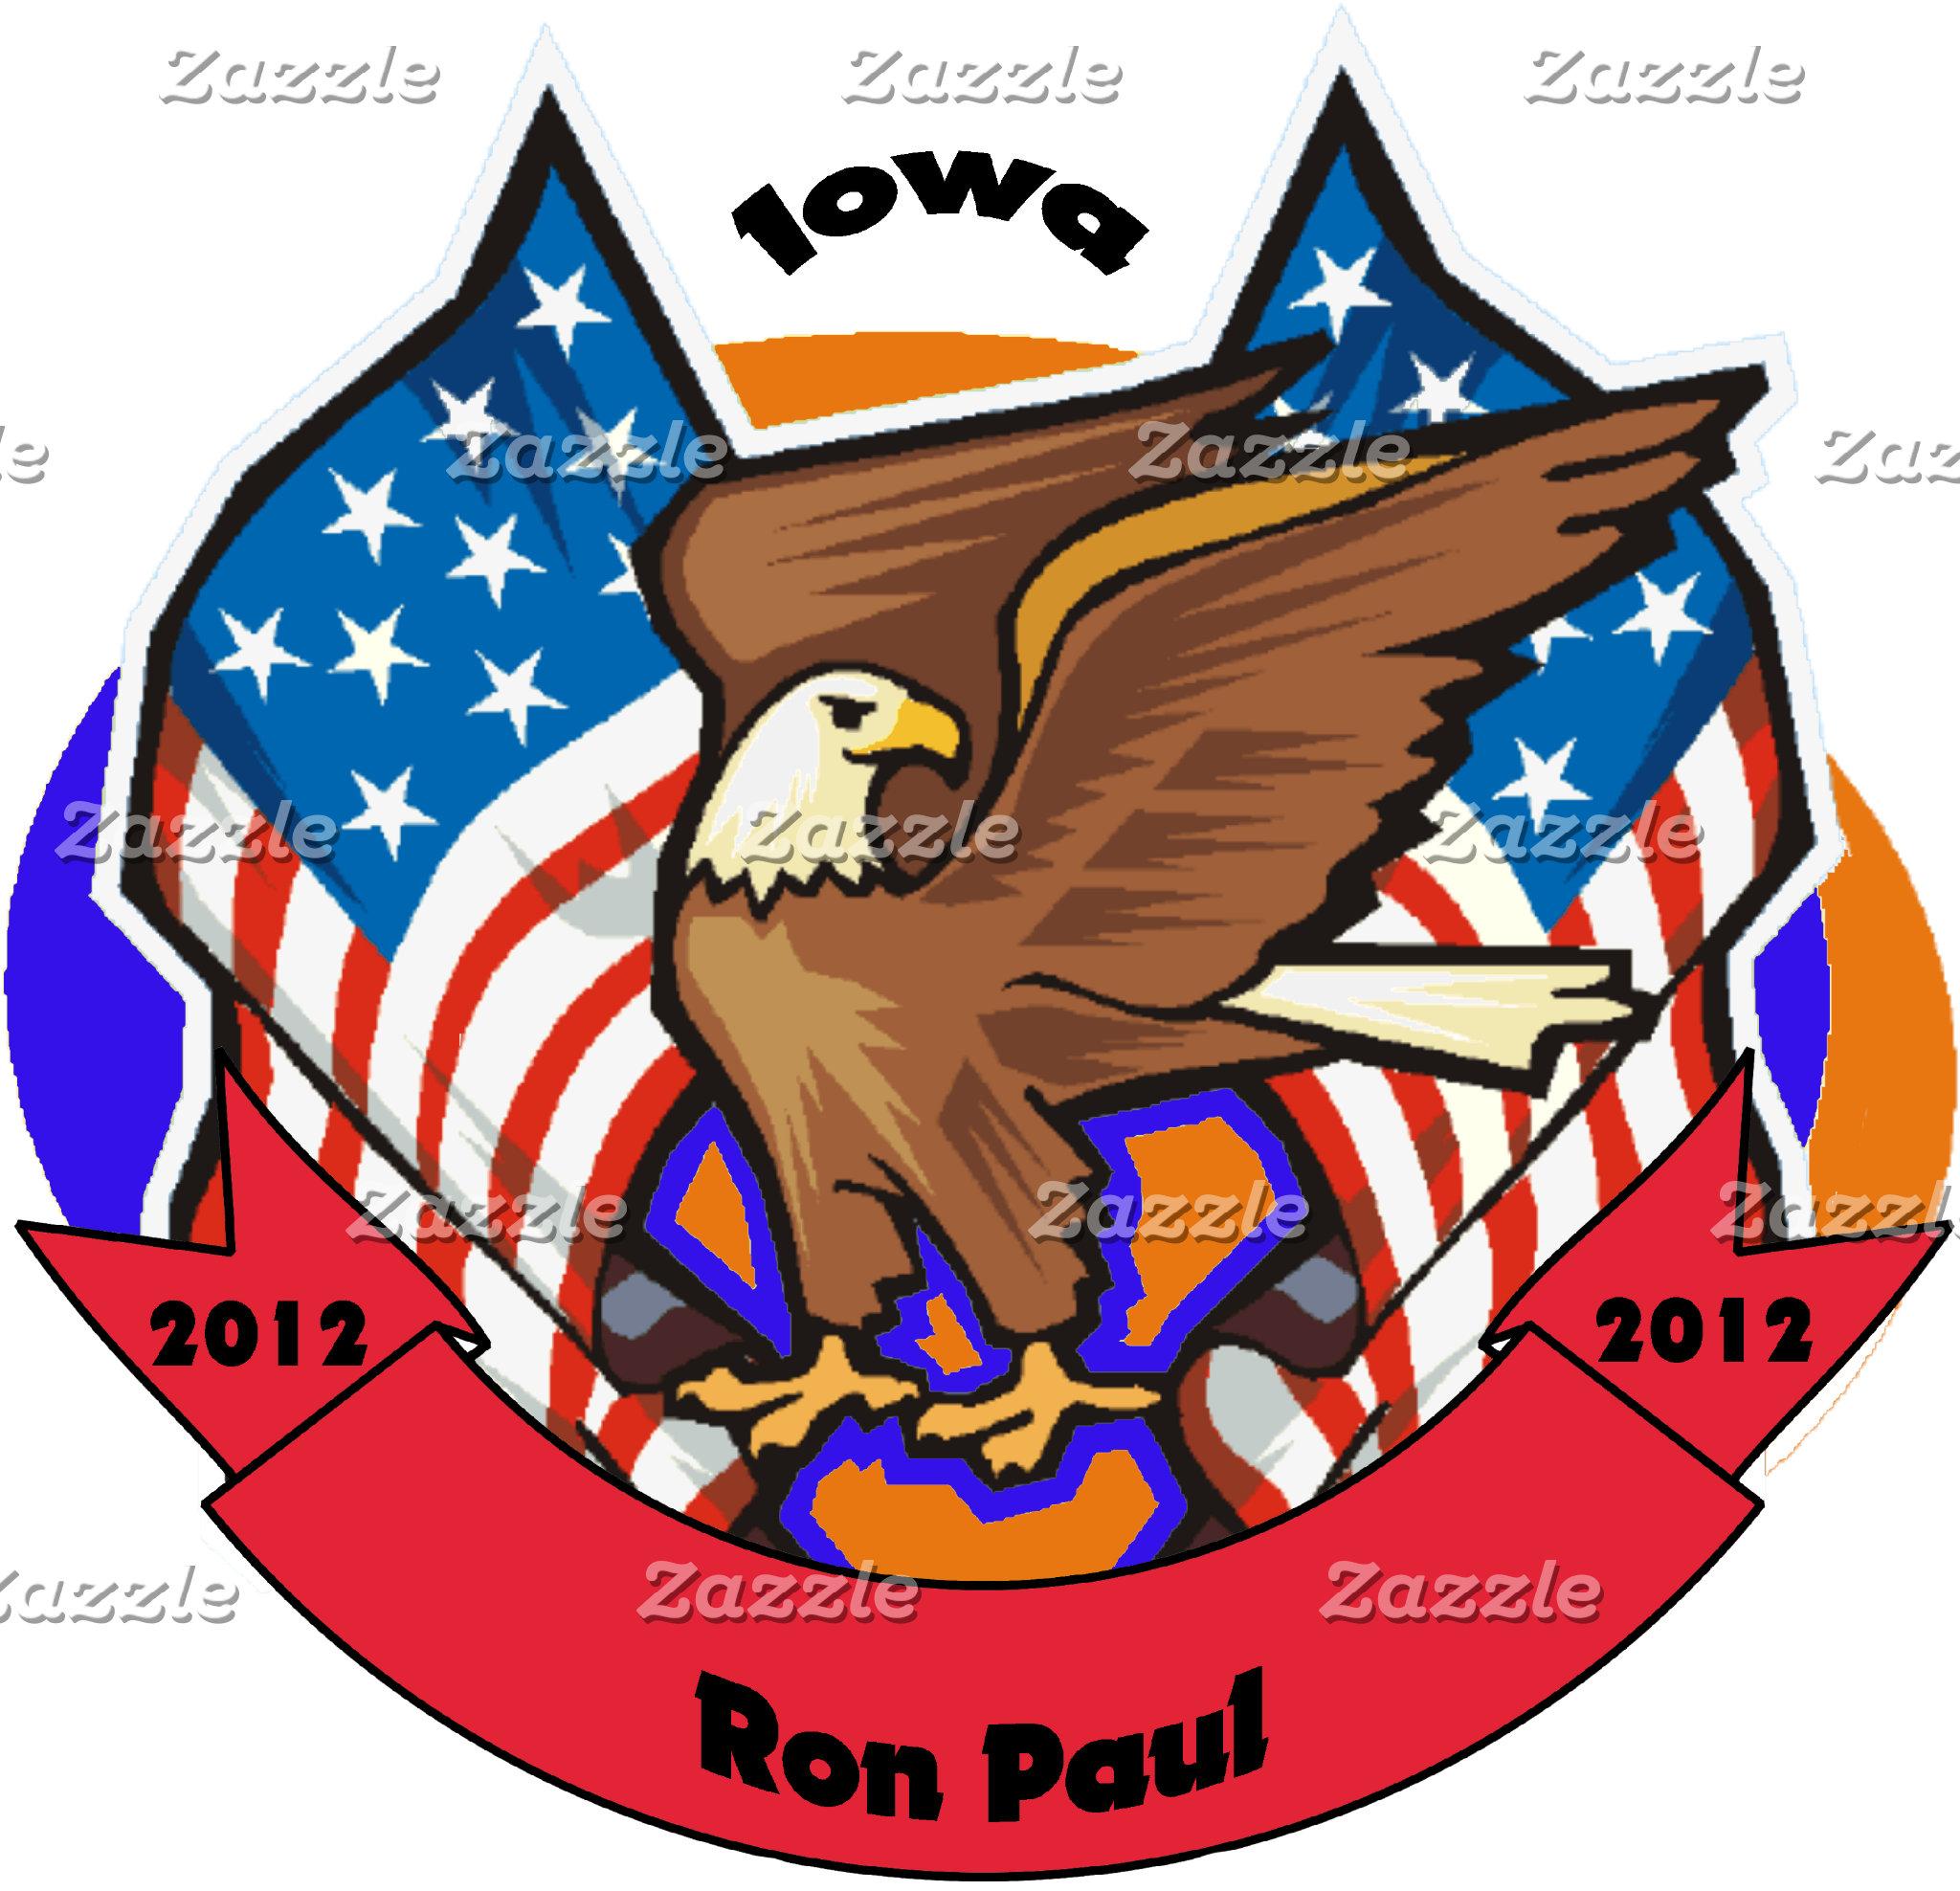 Iowa for Ron Paul